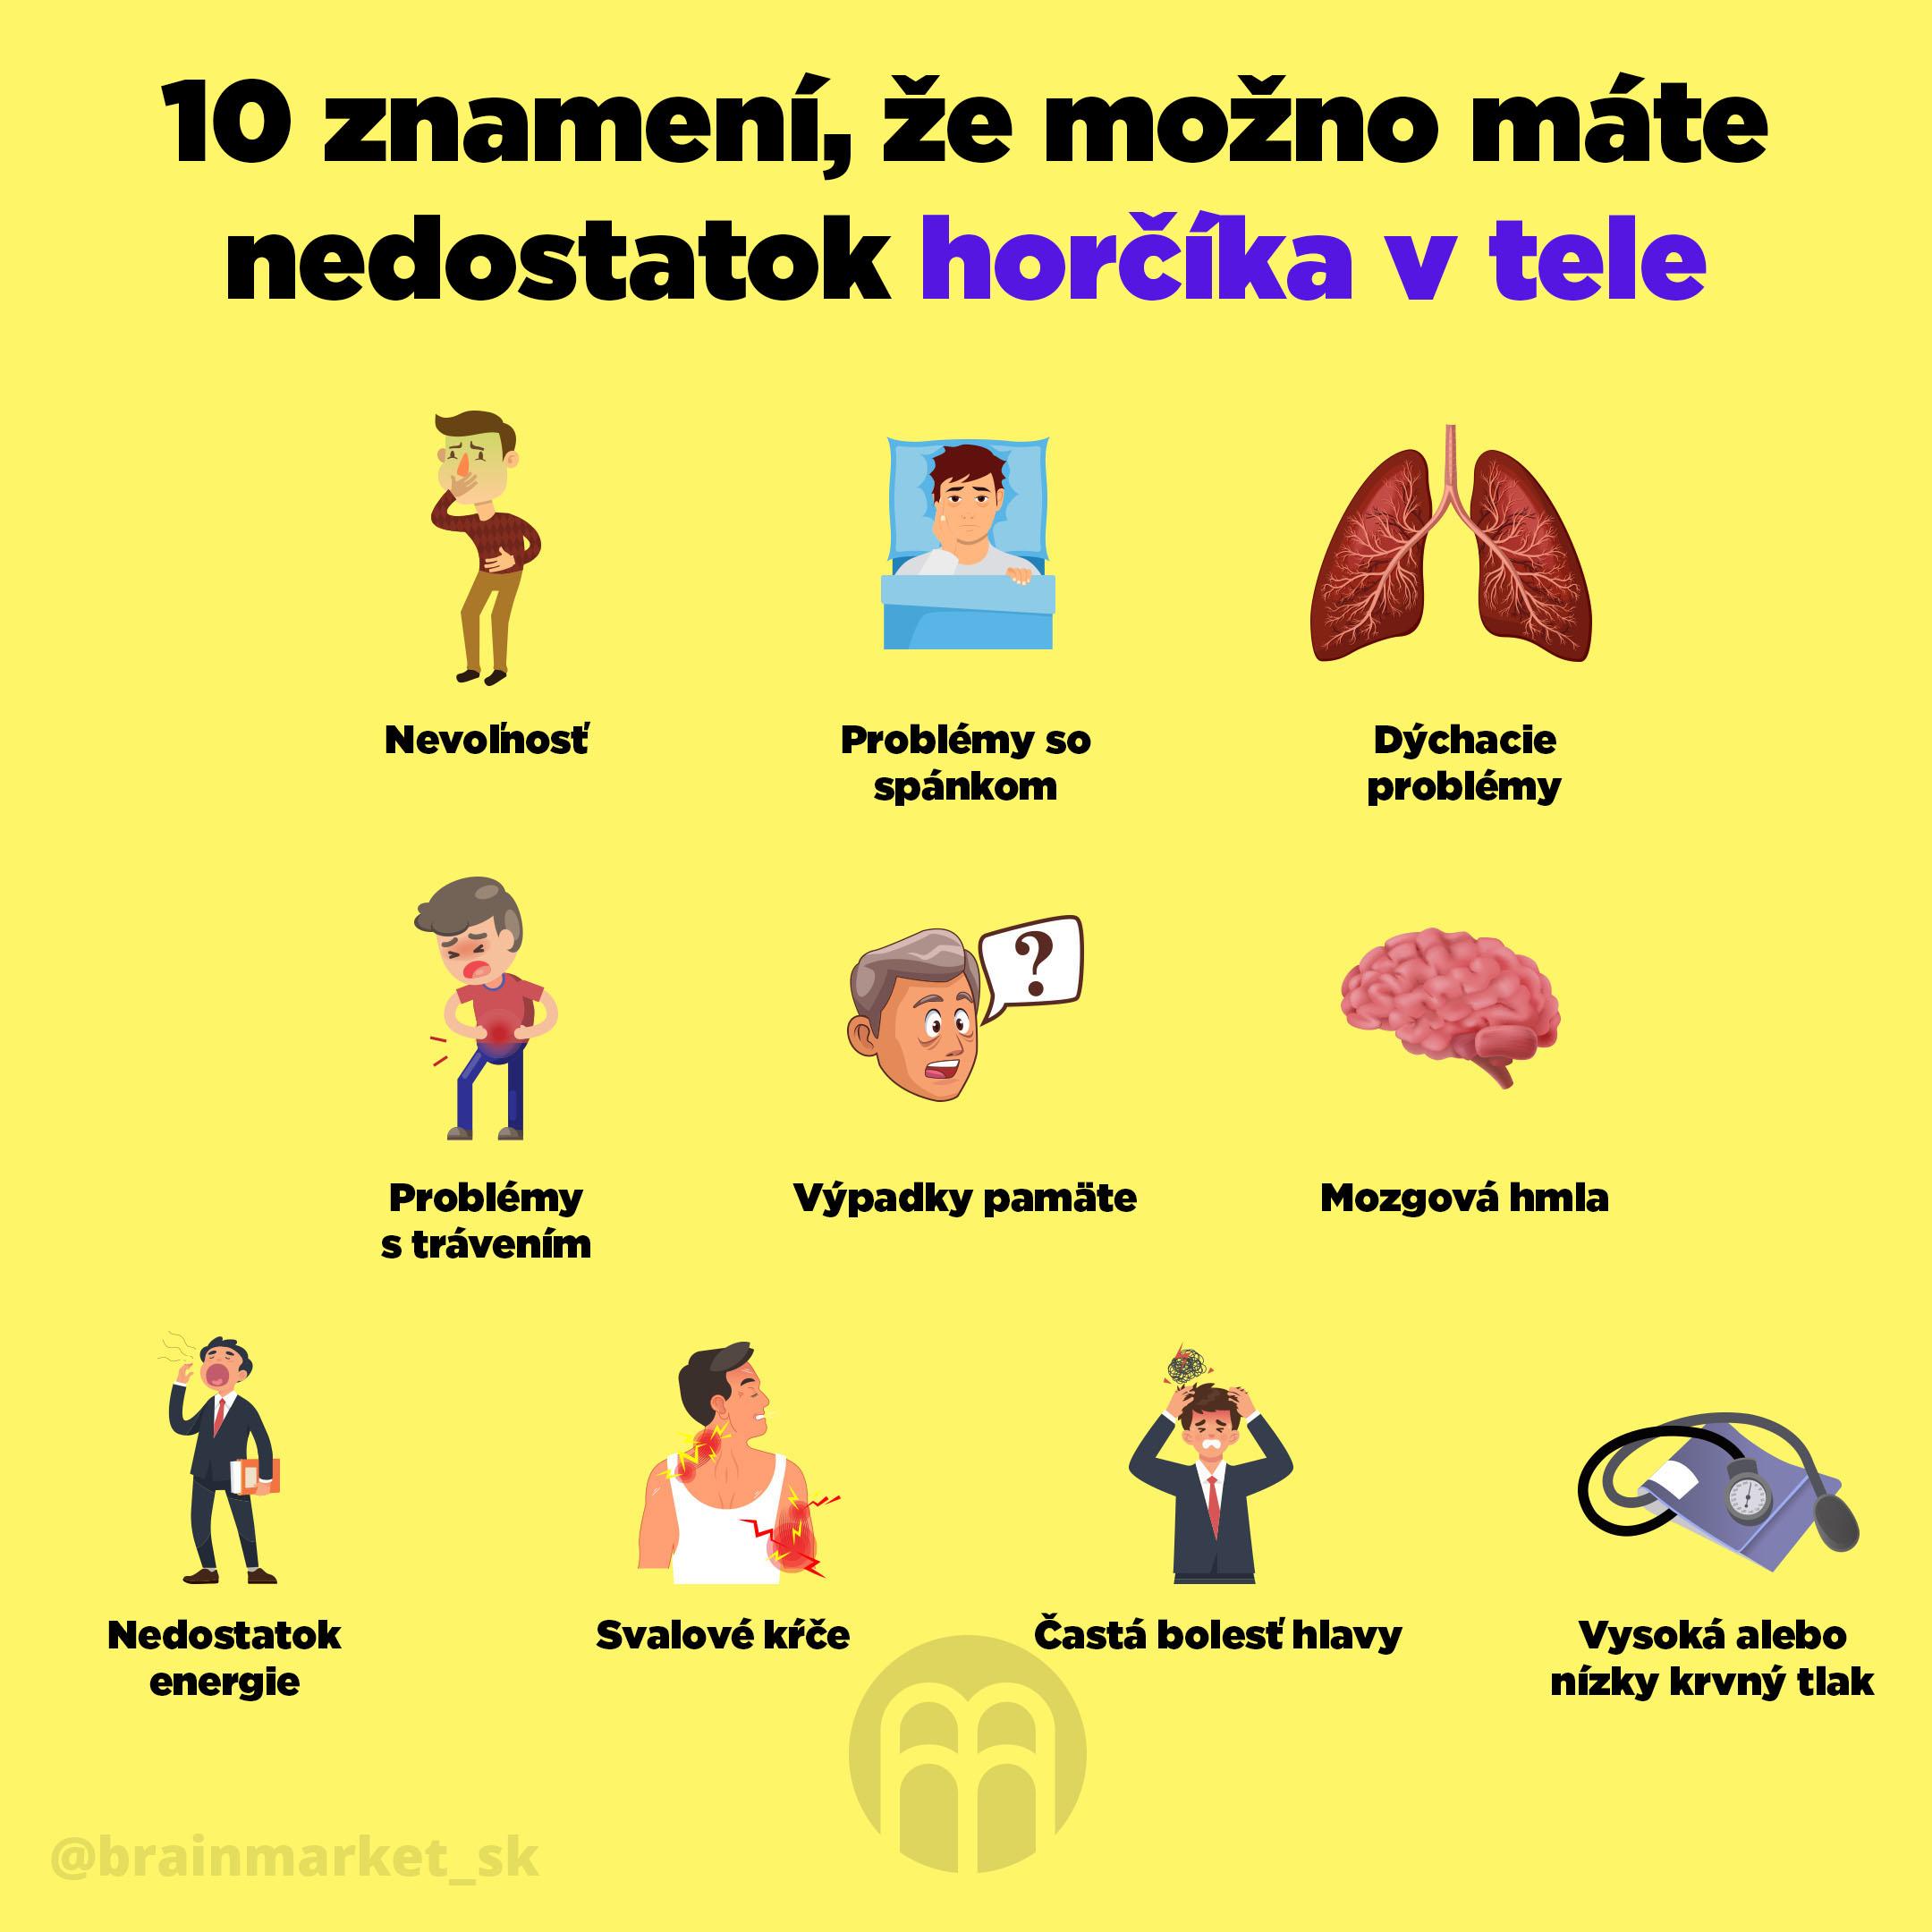 10_znameni_ze_mate_mozno_nedostatok_horcika_v_tele